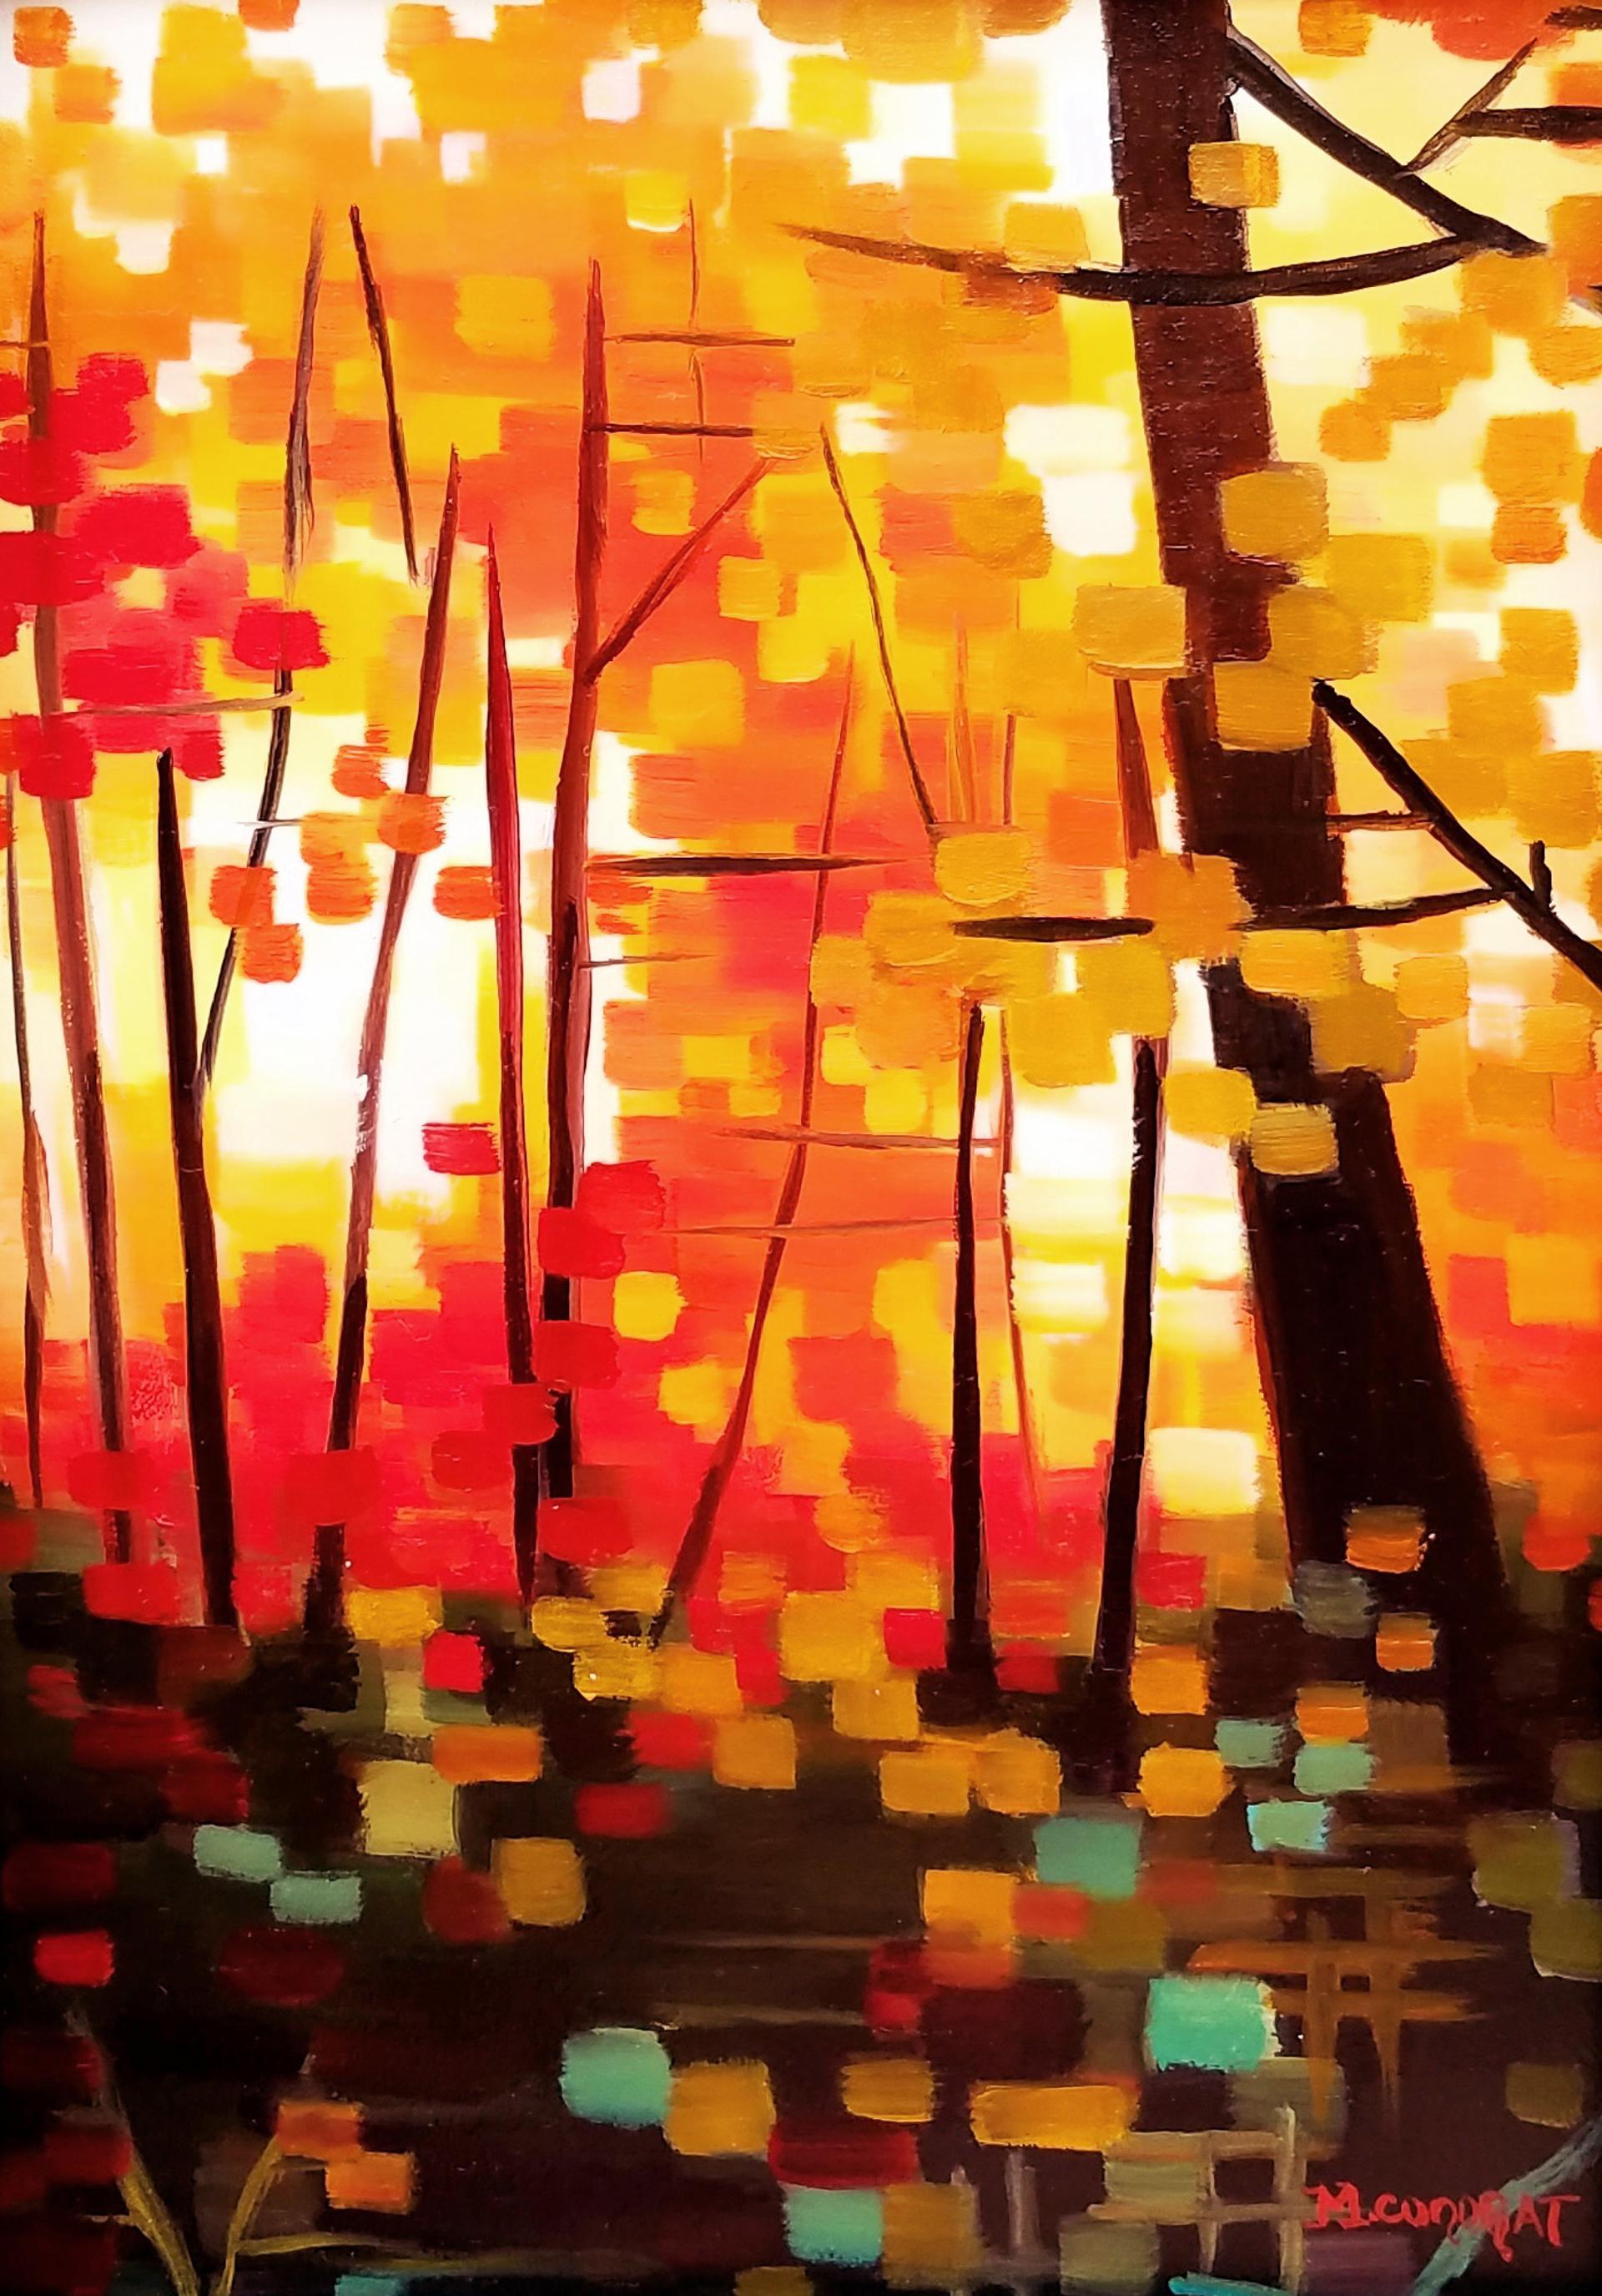 Ablaze with Autumn Colors by Michelle Condrat